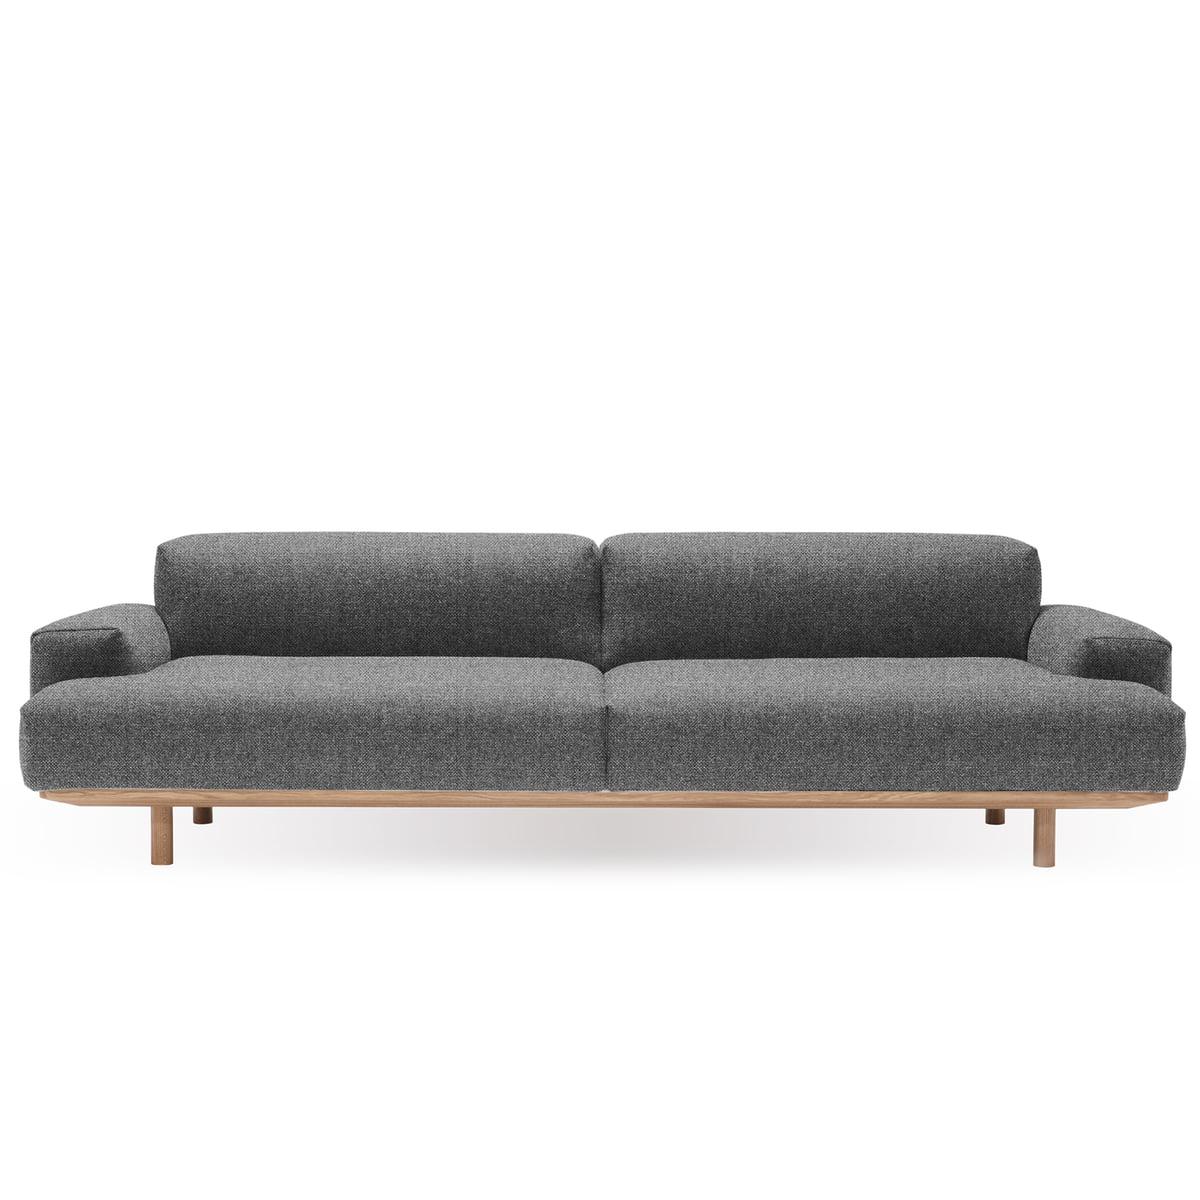 Full Size of Sofa 2 5 Sitzer Reason 140x200 Bett Bunt Luxus Rahaus Türkis 90x200 Weiß Leder Braun Le Corbusier Beziehen 3 200x200 160x220 Barock Sofa Sofa 2 5 Sitzer